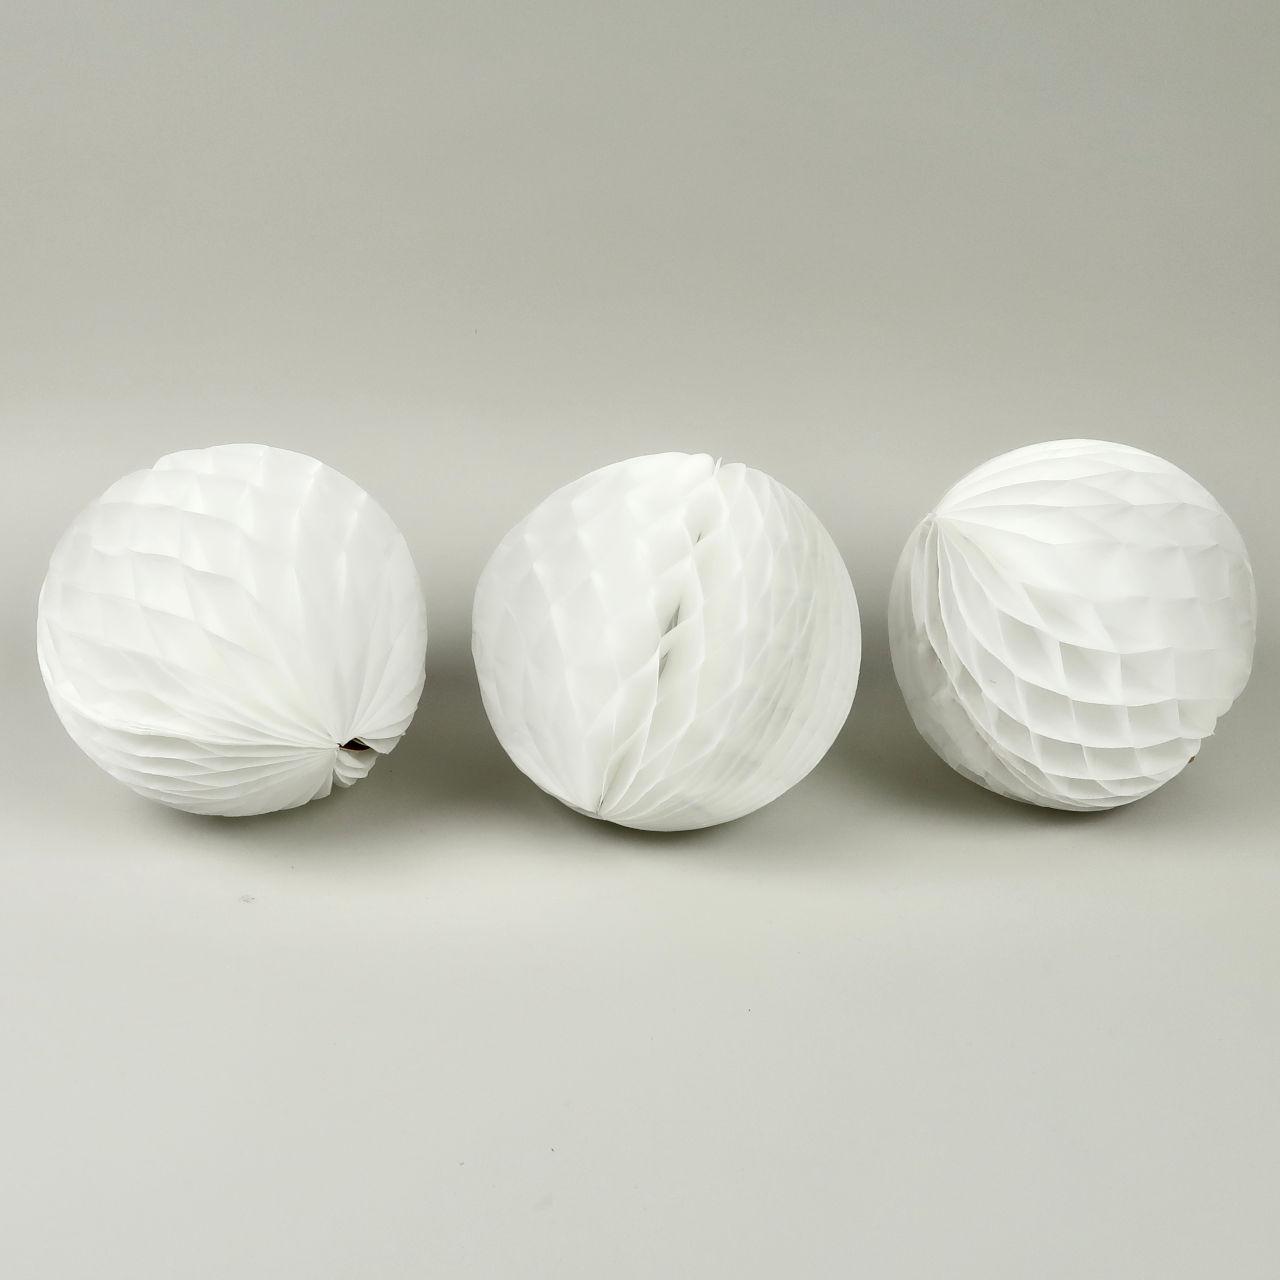 Honeycomb Paper Ball - 15cm Diameter - Pack of 3 - White